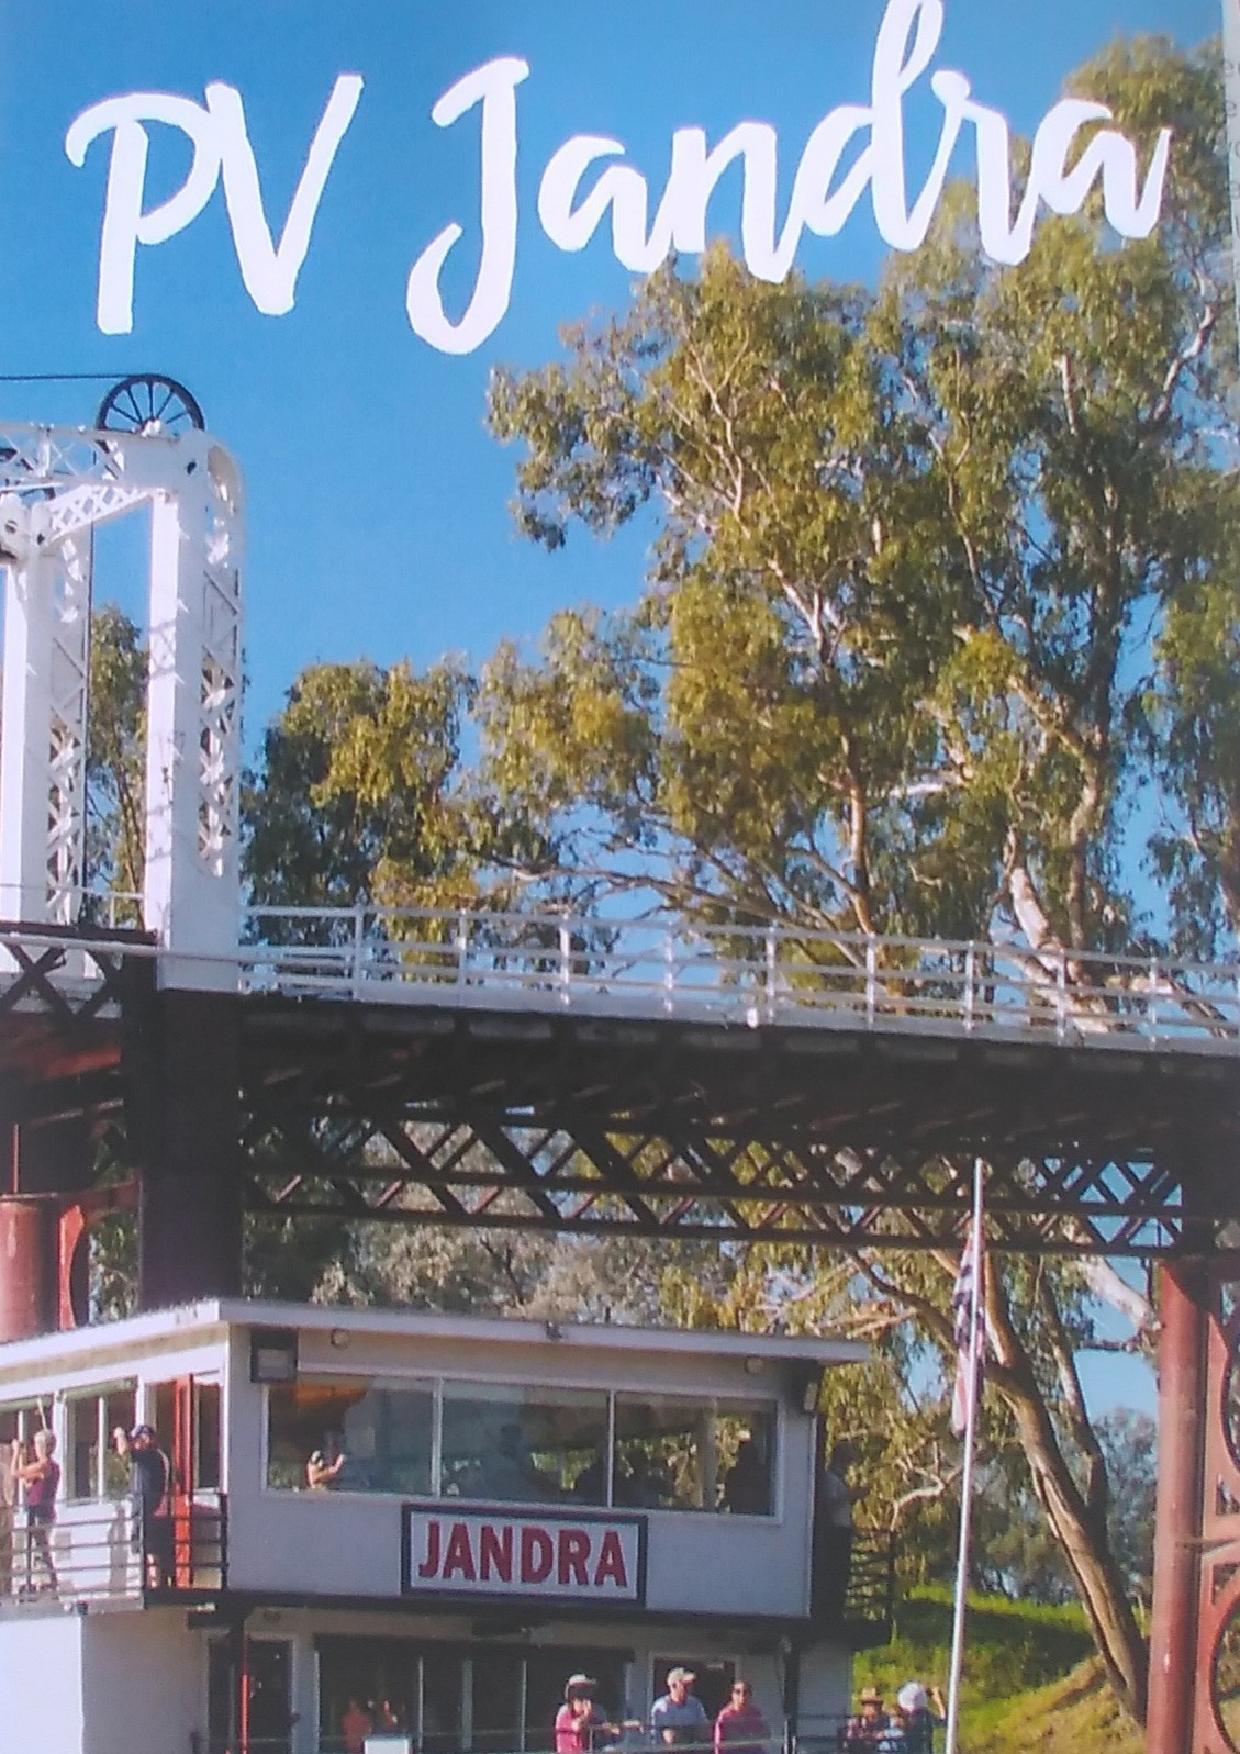 PV Jandra - Local Tours - Sunshine Garden Bourke Resort